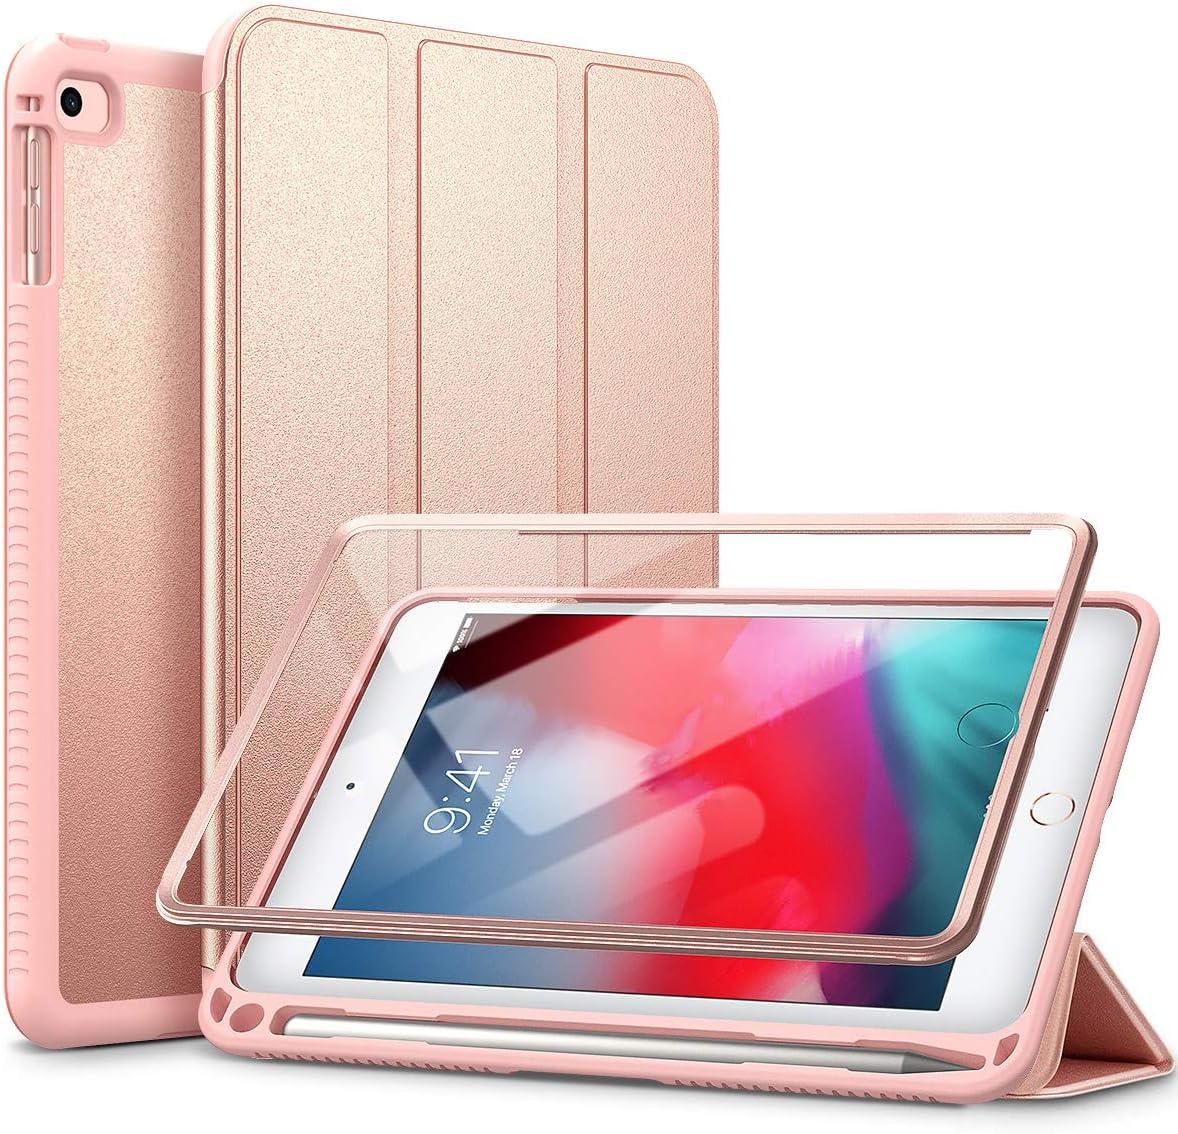 "SURITCH Case for iPad Mini 4/iPad Mini 5,【Built in Screen Protector】【Auto Sleep/Wake】【Pencil Holder】 Lightweight Leather Case Flip Cover with Stand for iPad Mini 4/Mini 5 7.9""(Rose Gold)"